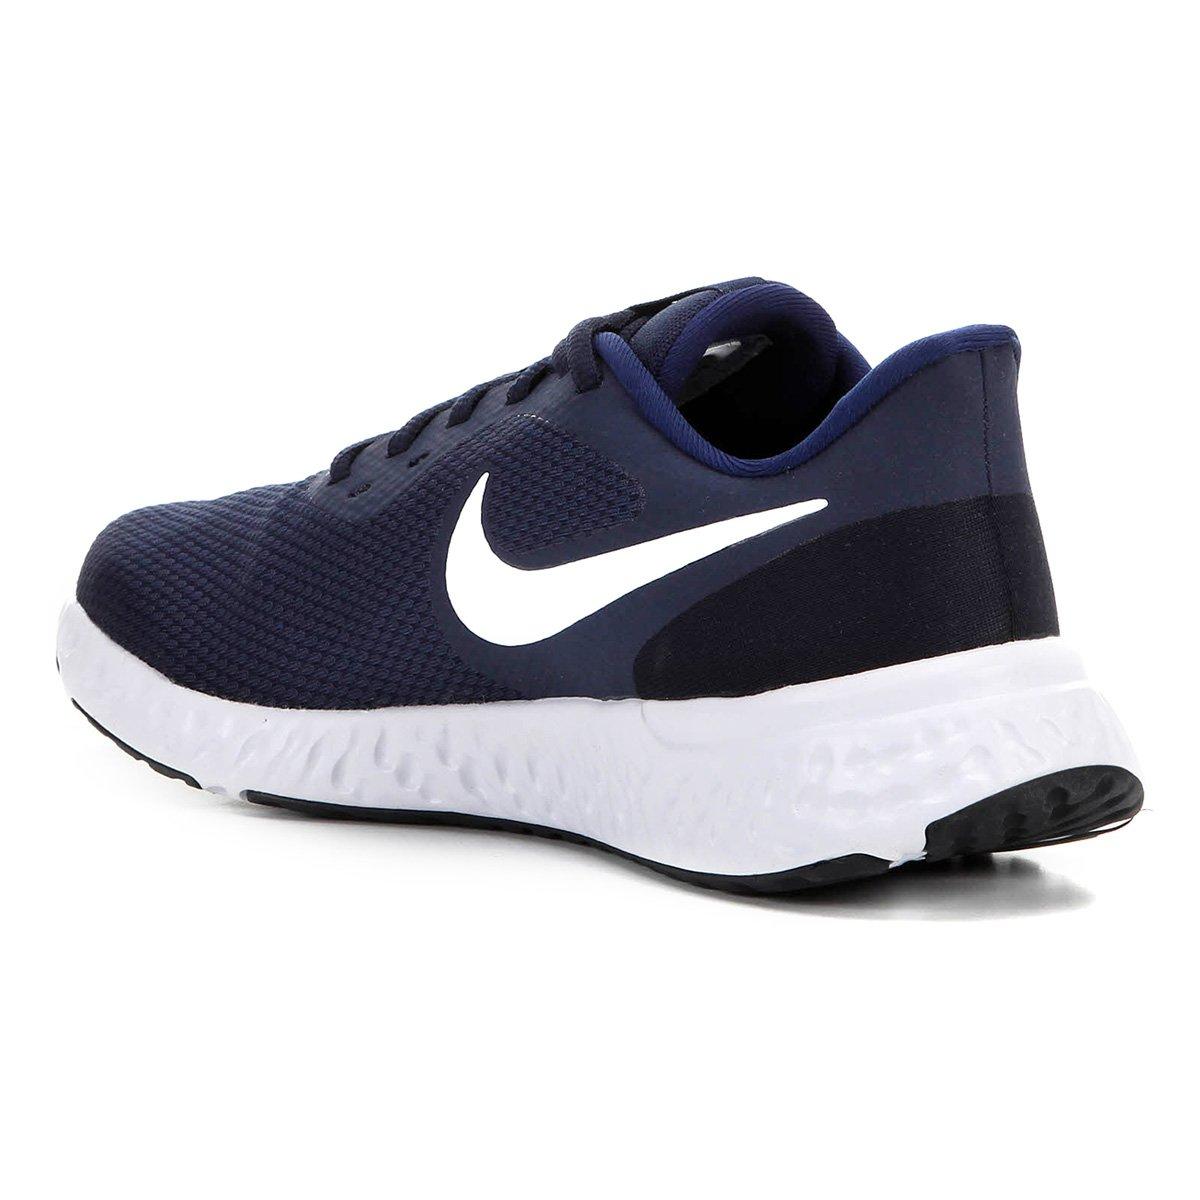 Tênis Nike Revolution 5 Masculino - Tam: 39 - 3